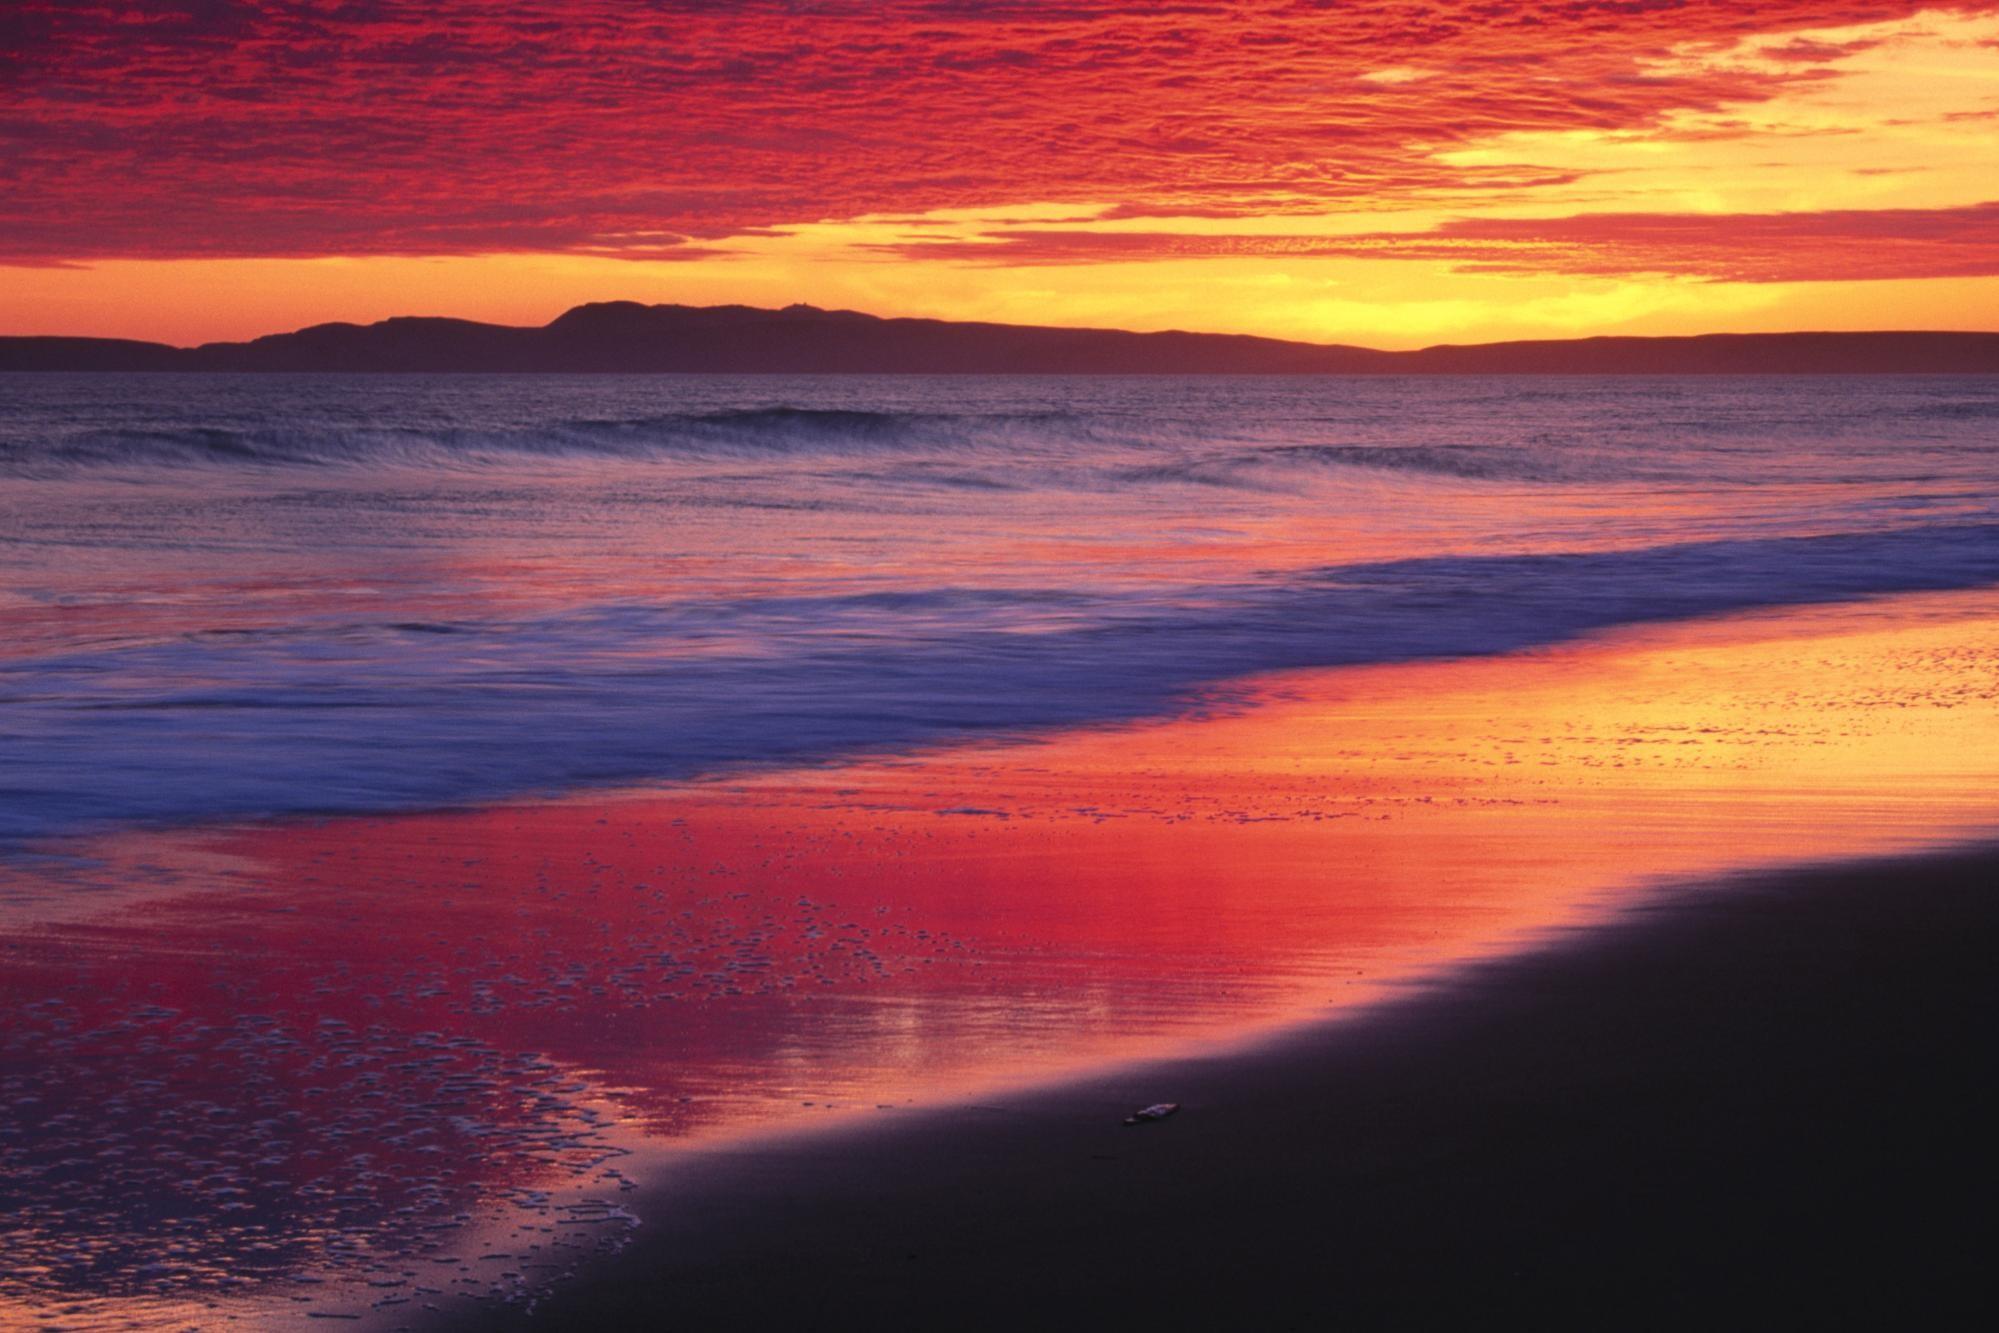 Free Sunset Wallpapers ,Sunset,Beautiful Sunset Pc Wallpapers .